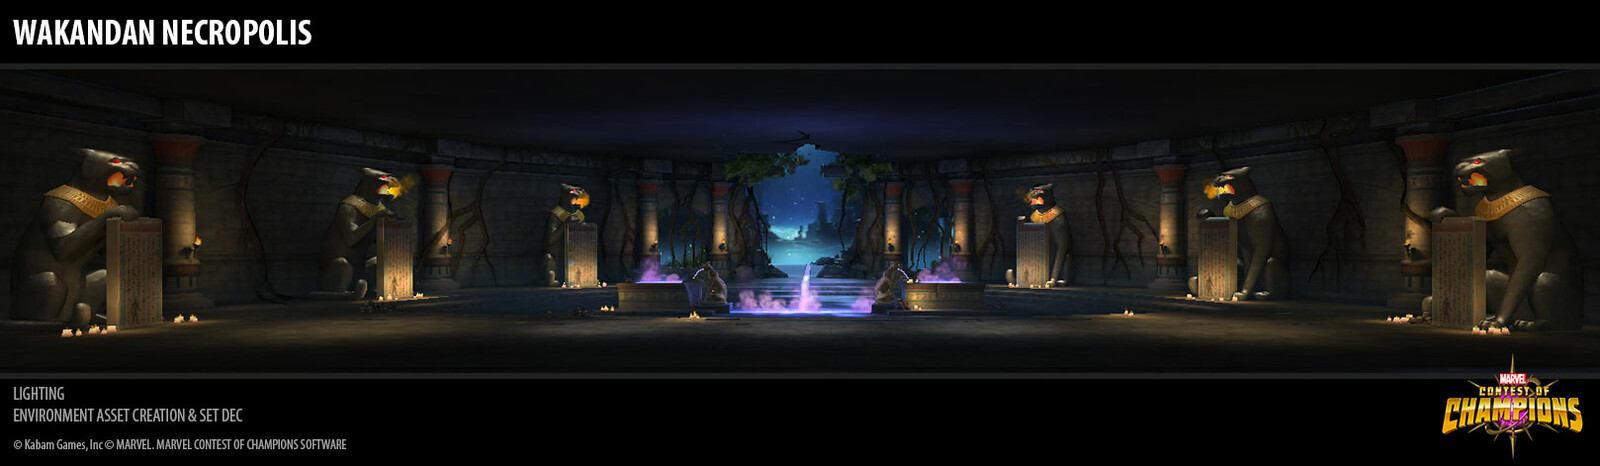 Full scene view